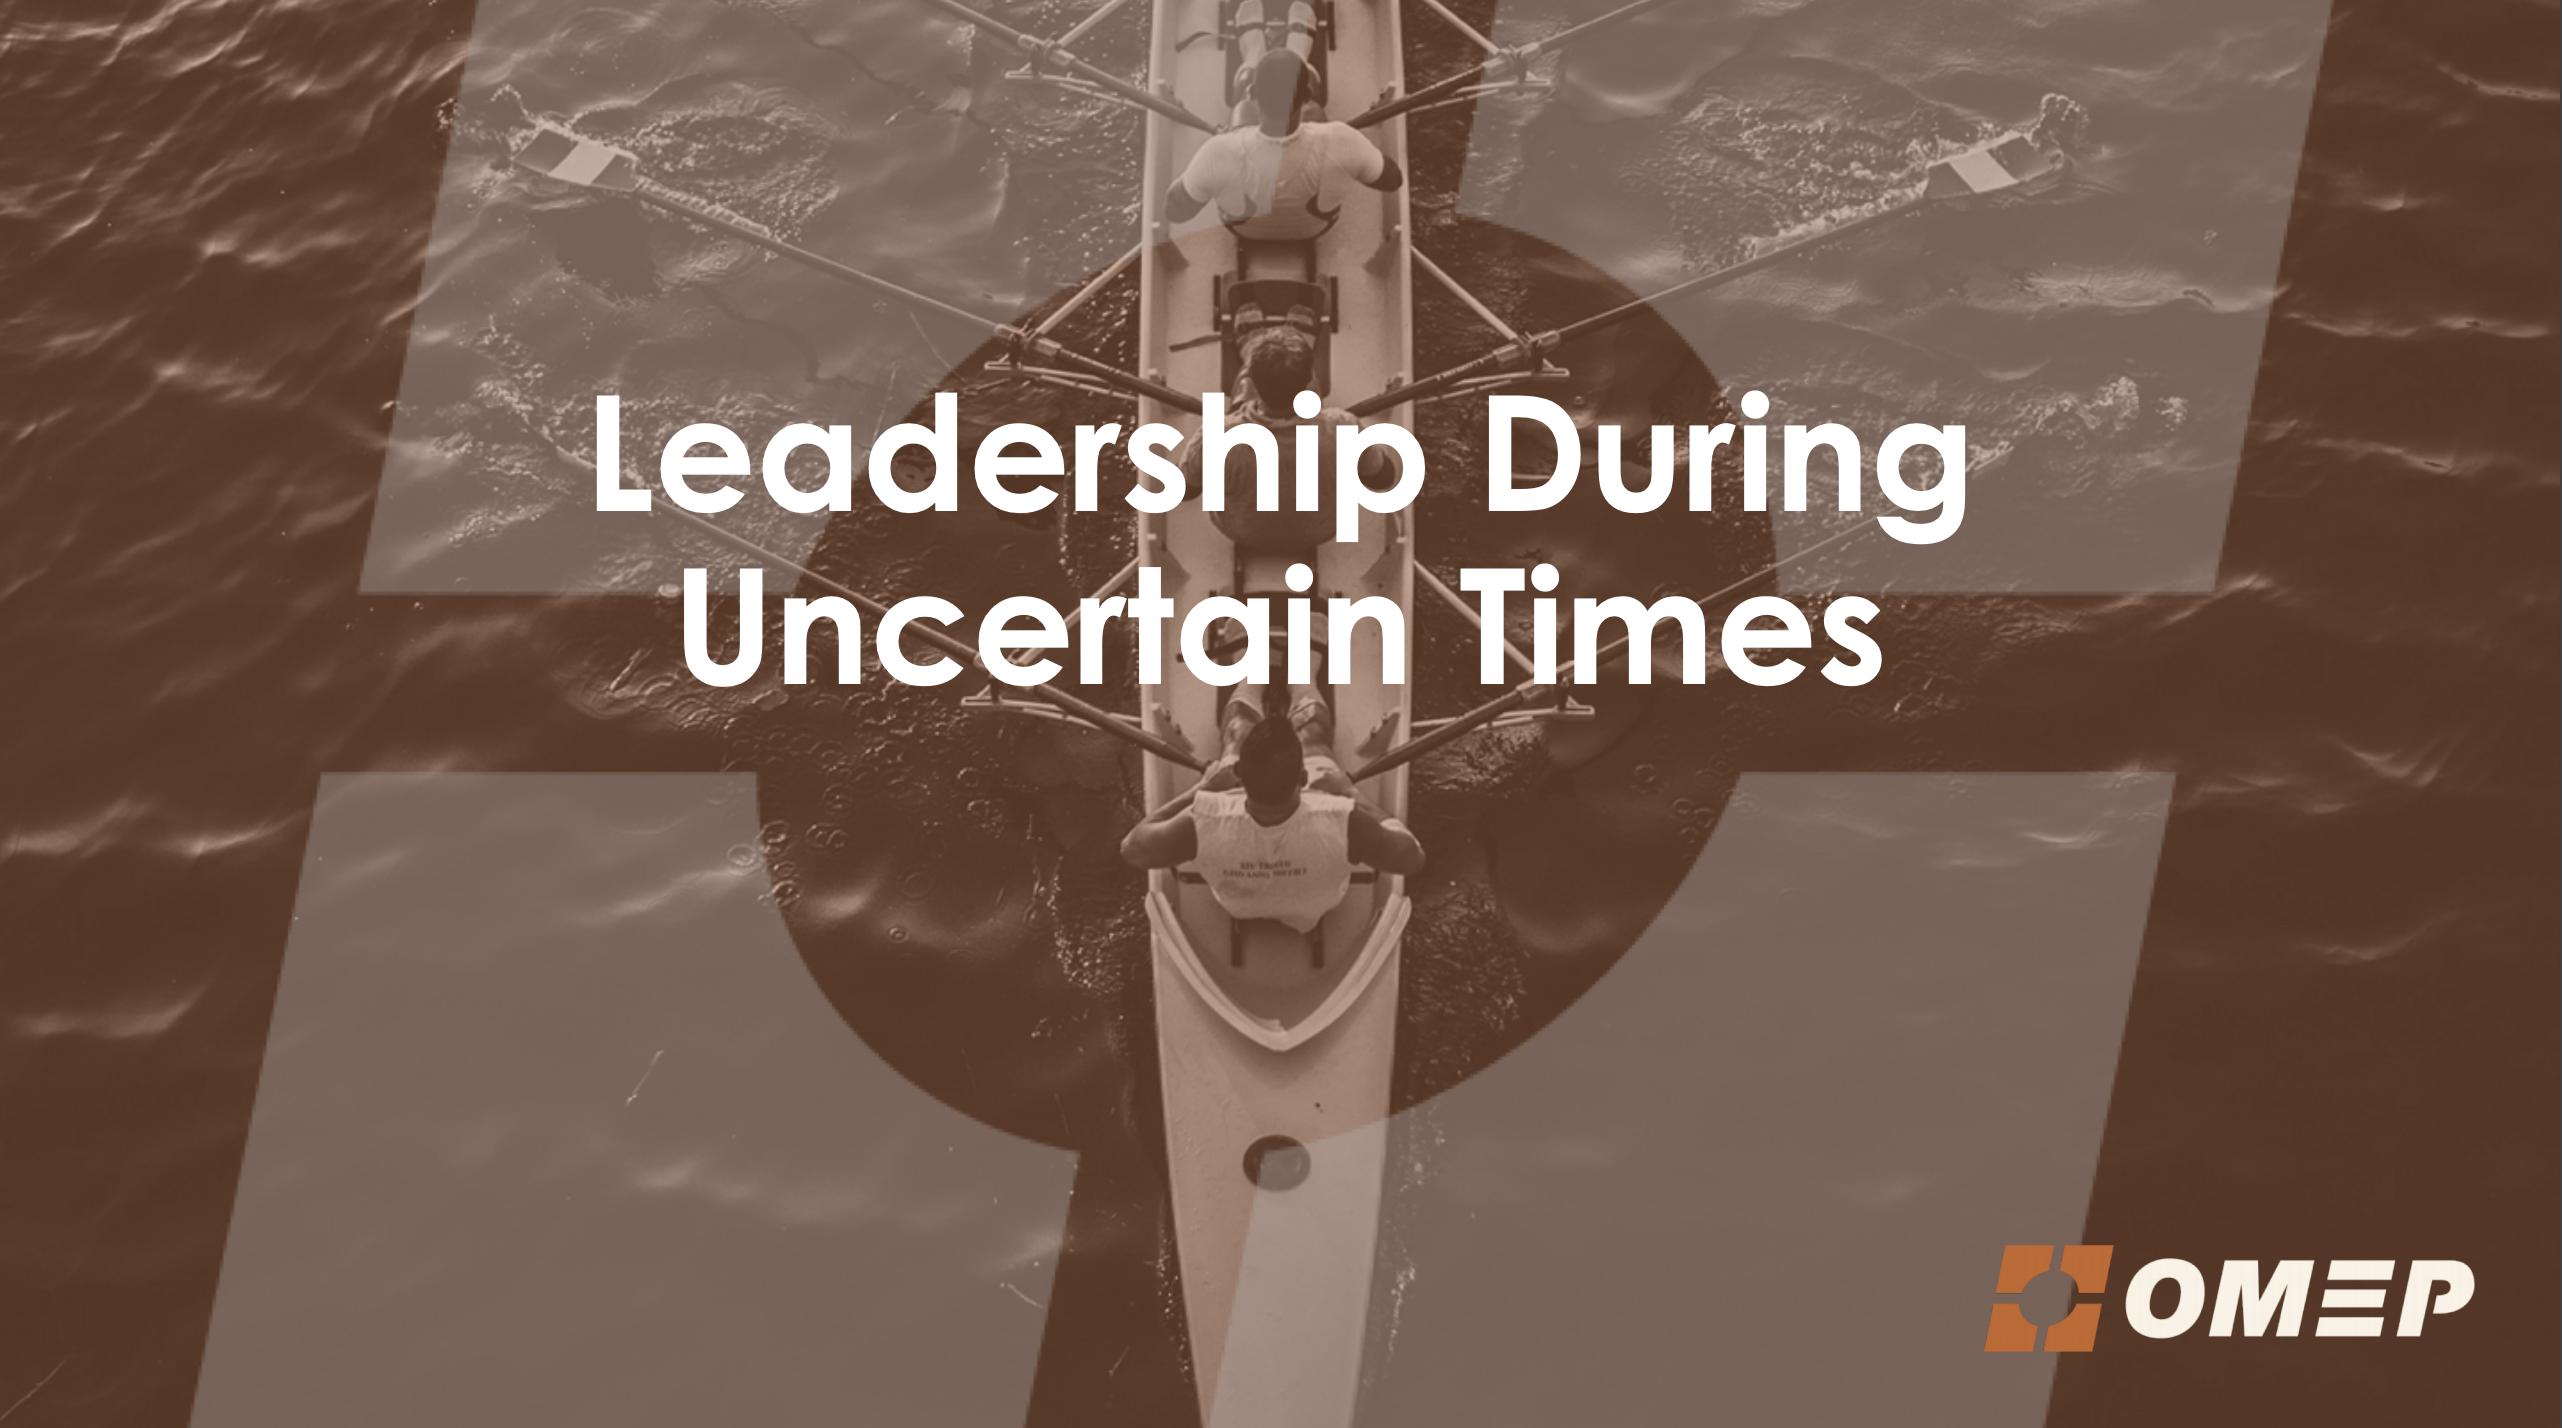 Leadership During Uncertain Times Webinar Titll